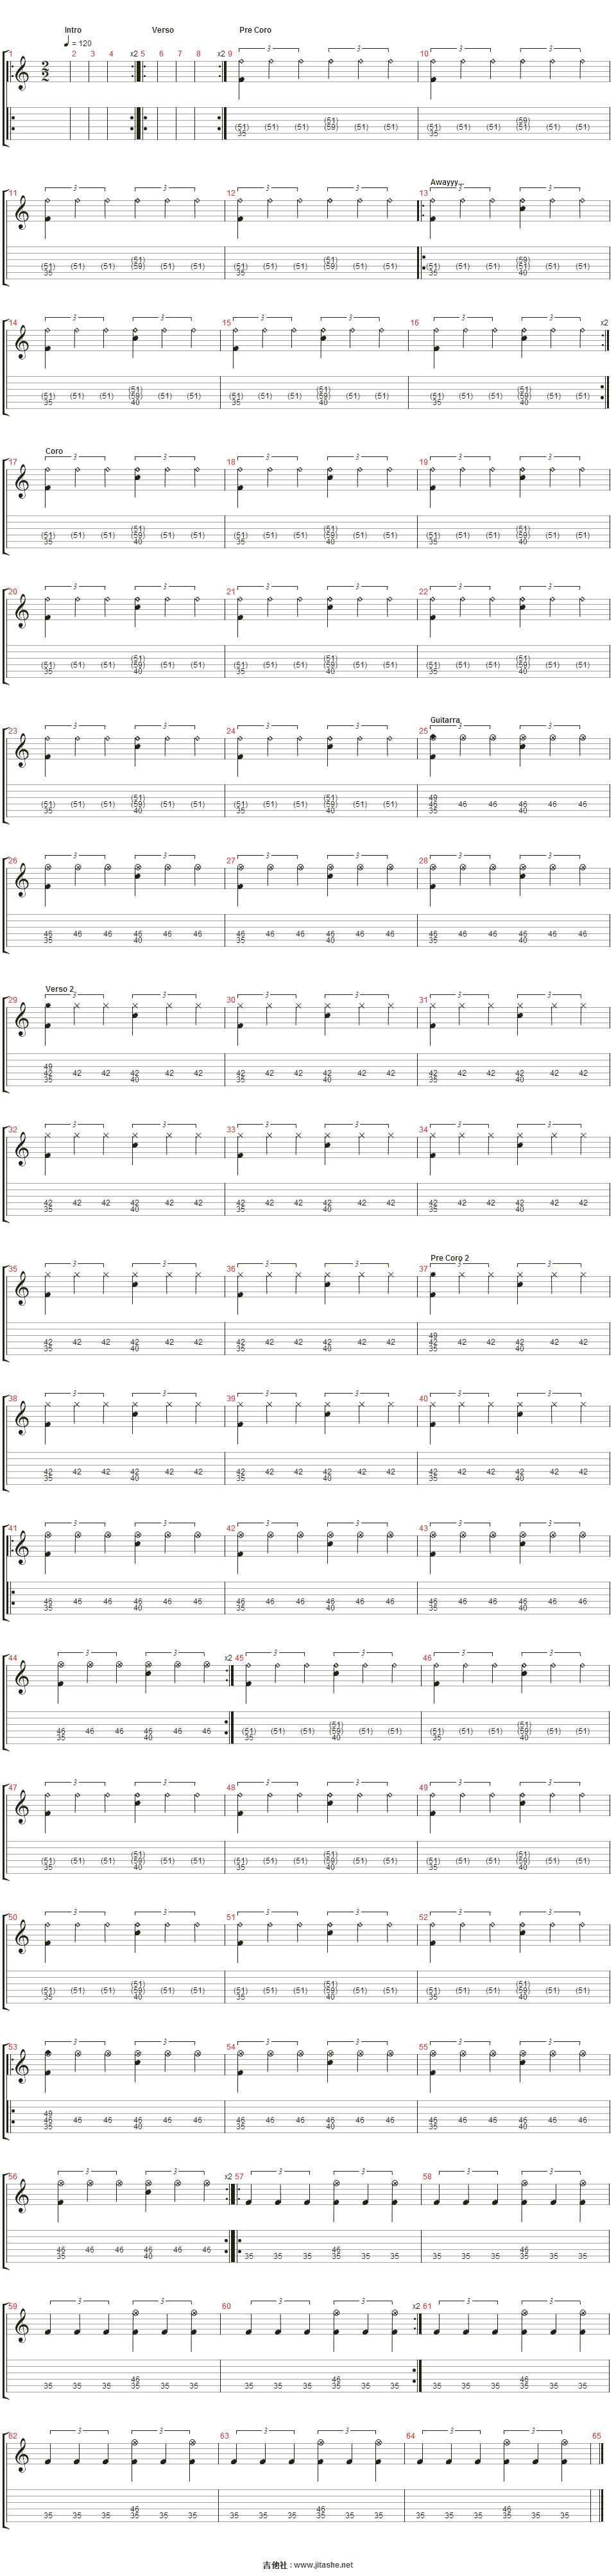 �n _locked away吉他谱(percusi髇)_the gathering